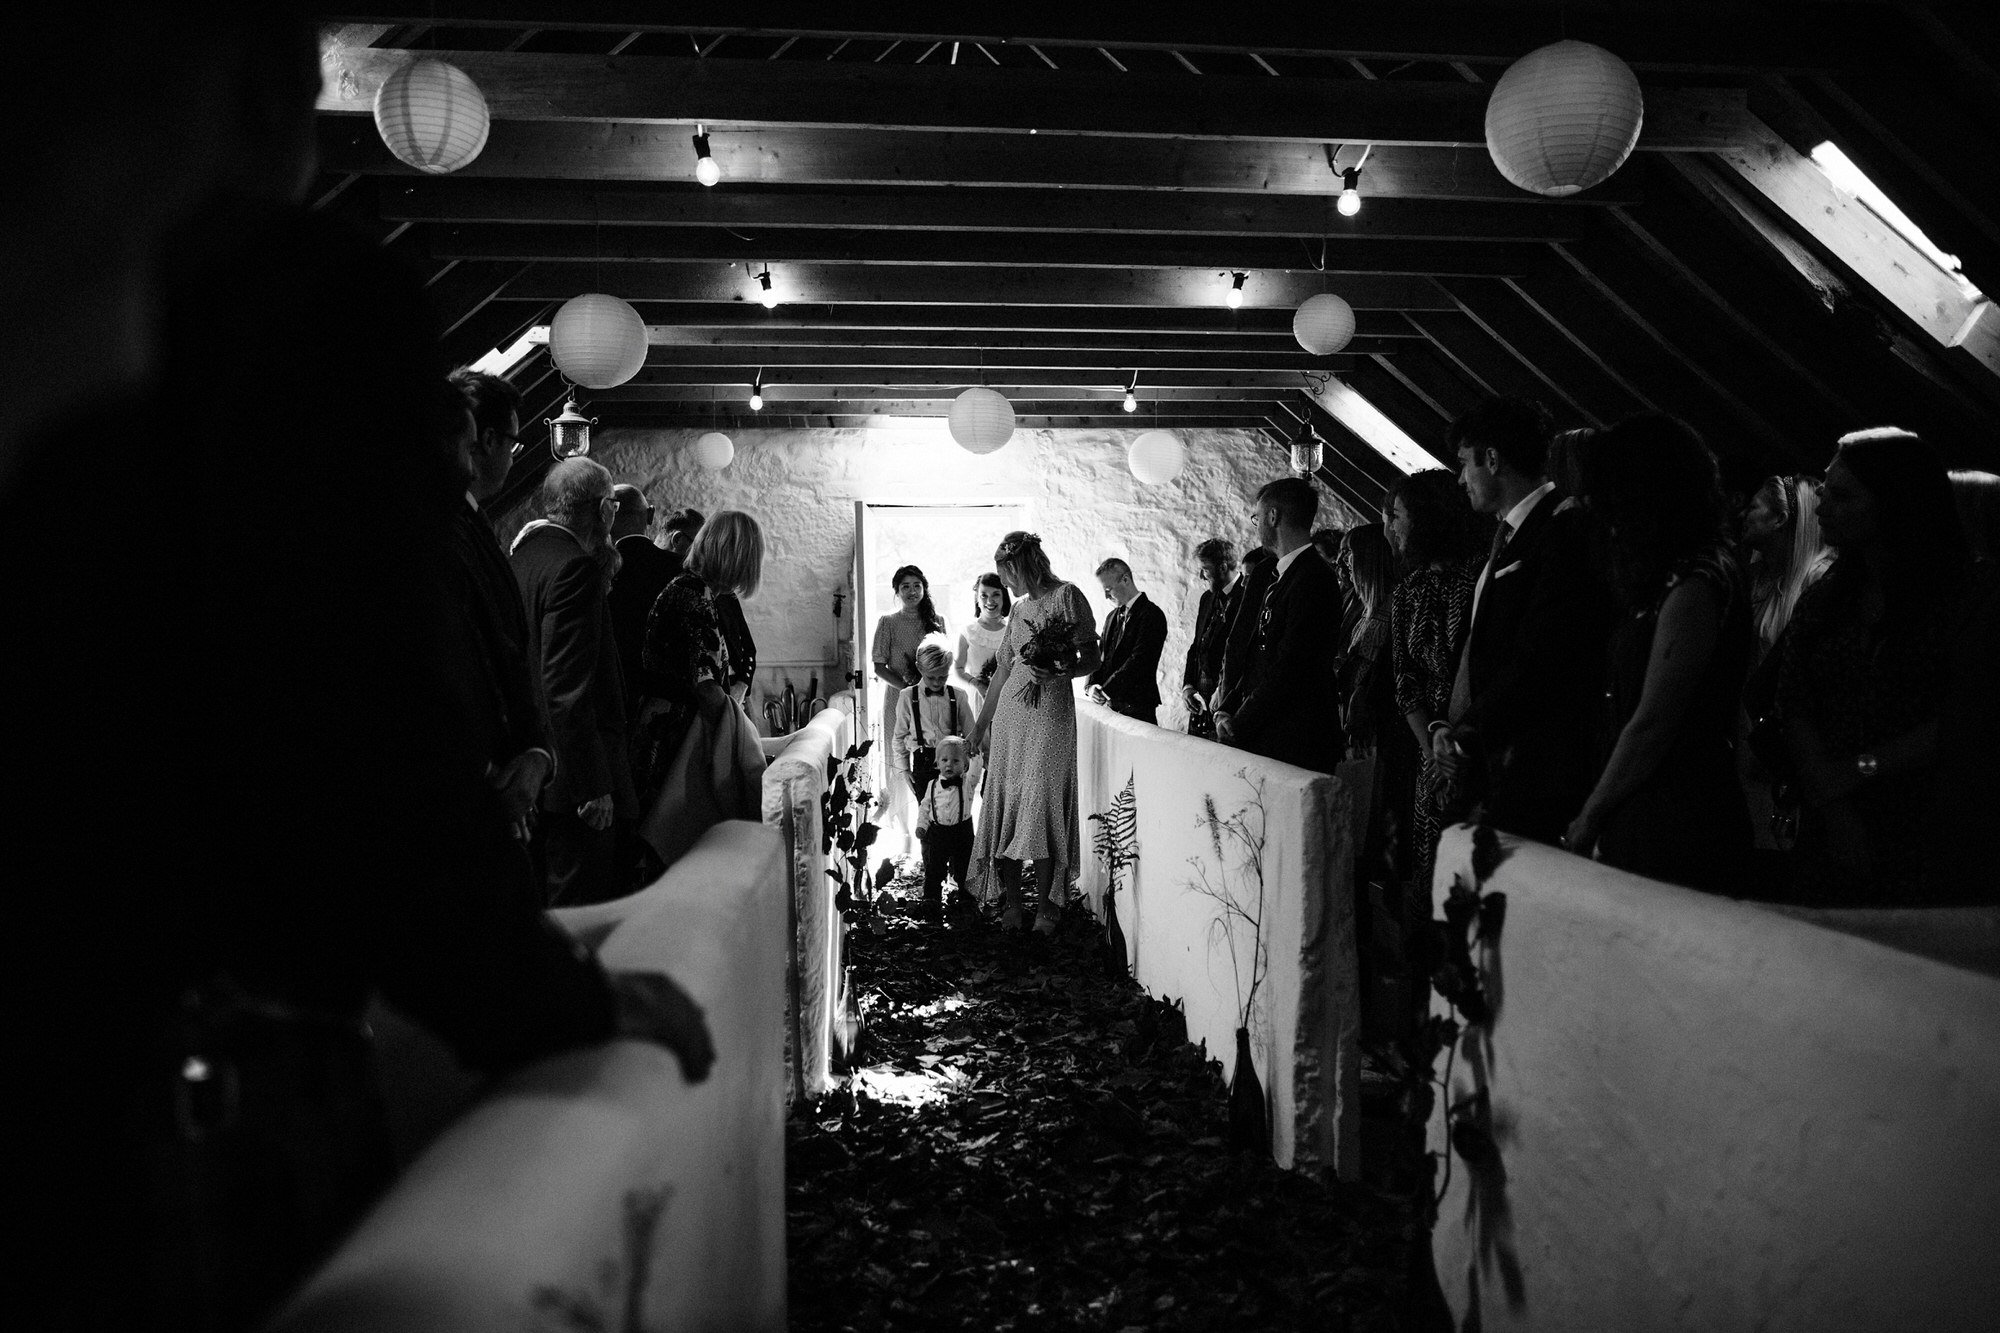 013 TIN SHED KNOCKRAICH WEDDING AUTUMN ZOE ALEXANDRA PHOTOGRAPHY